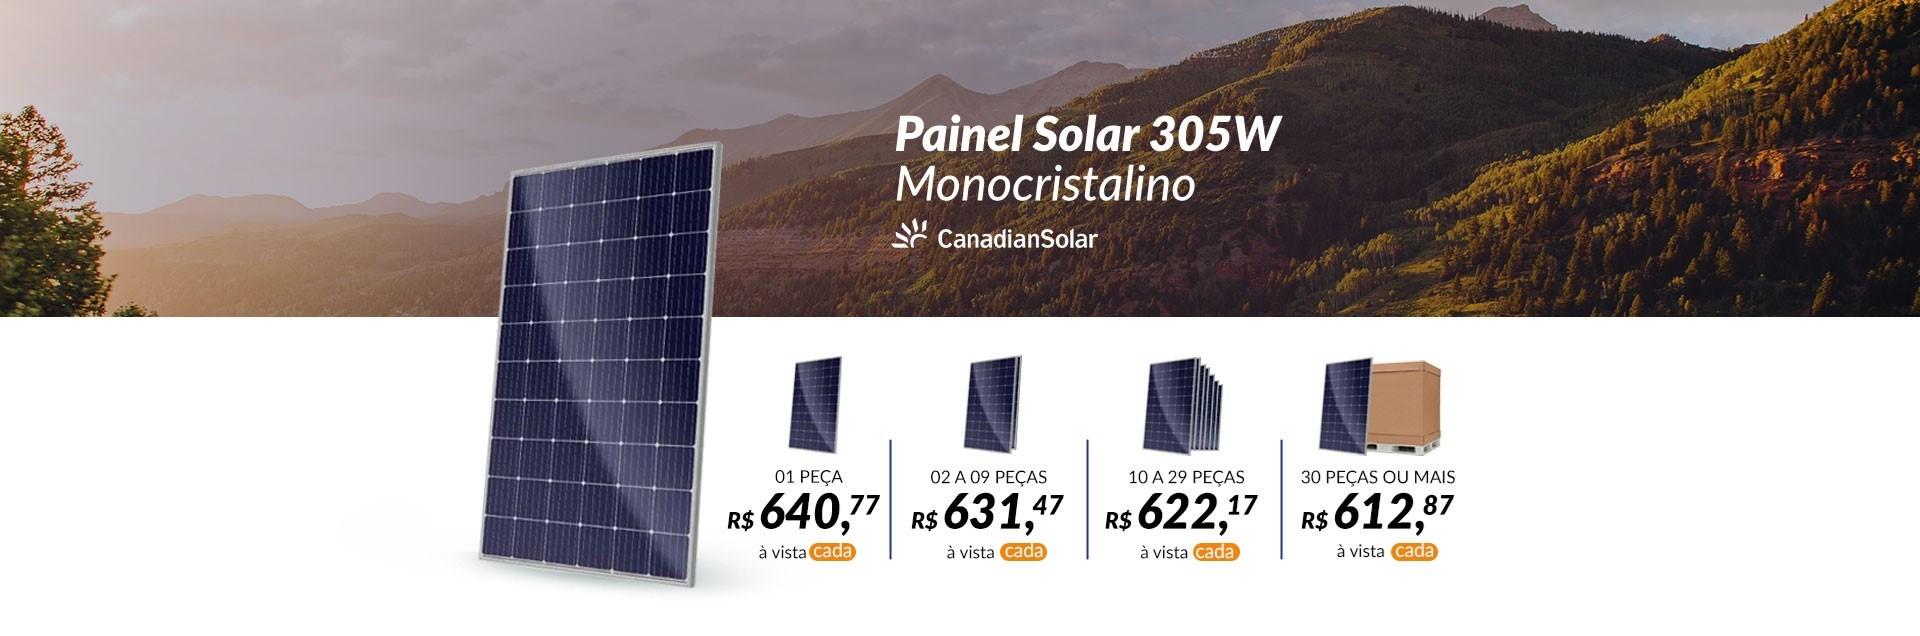 Banner Painel Solar 305W Monocristalino Canadian Solar